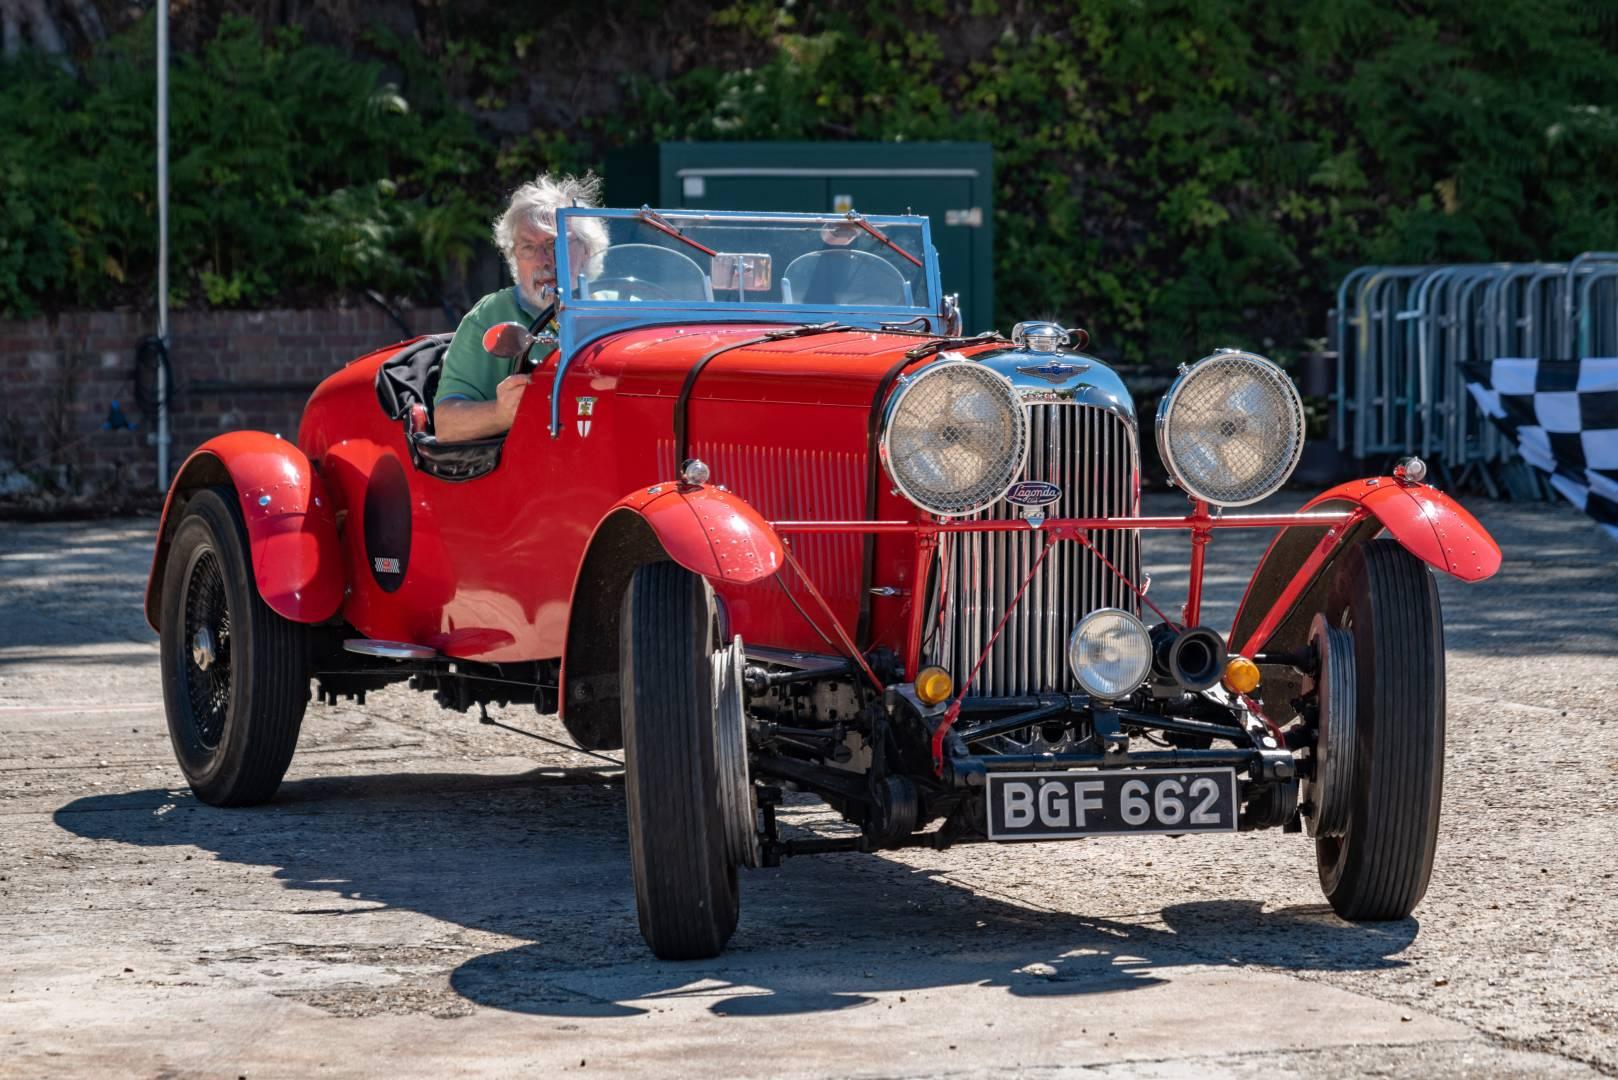 A beautiful prewar Lagonda is put through its faces on the finishing straight